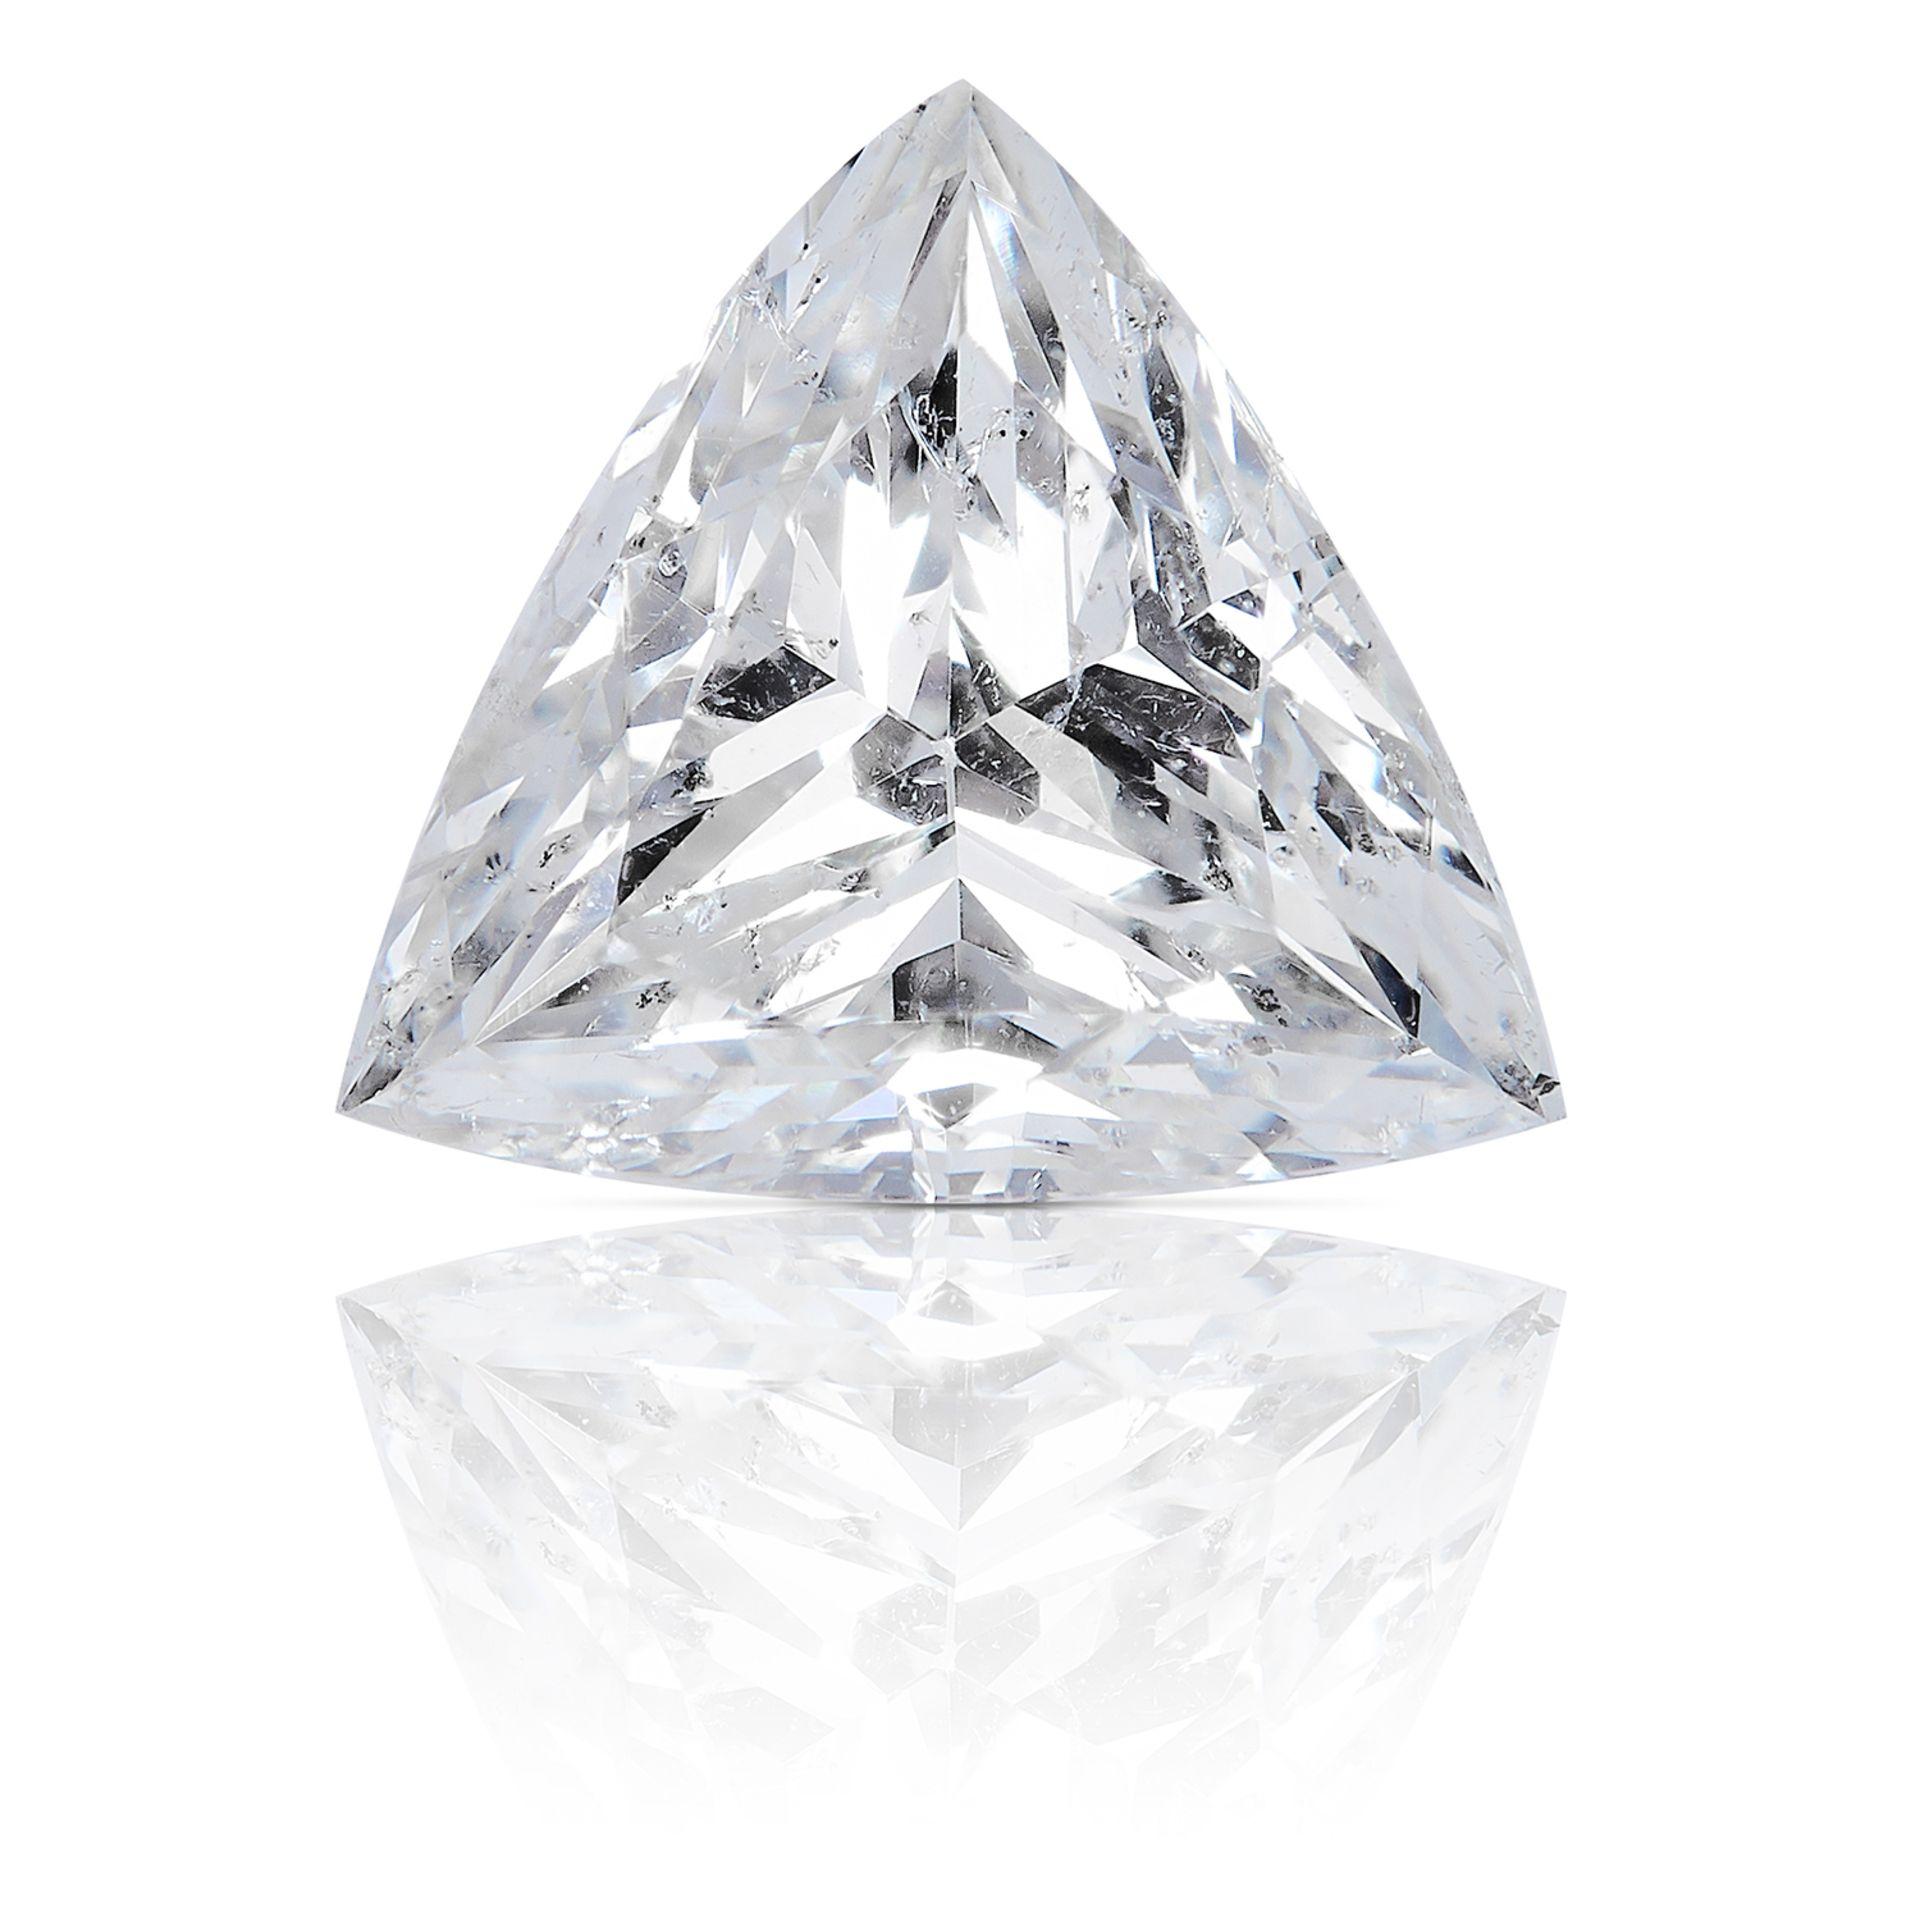 A 1.12ct TRIANGULAR BRILLIANT CUT DIAMOND, UNMOUNTED.